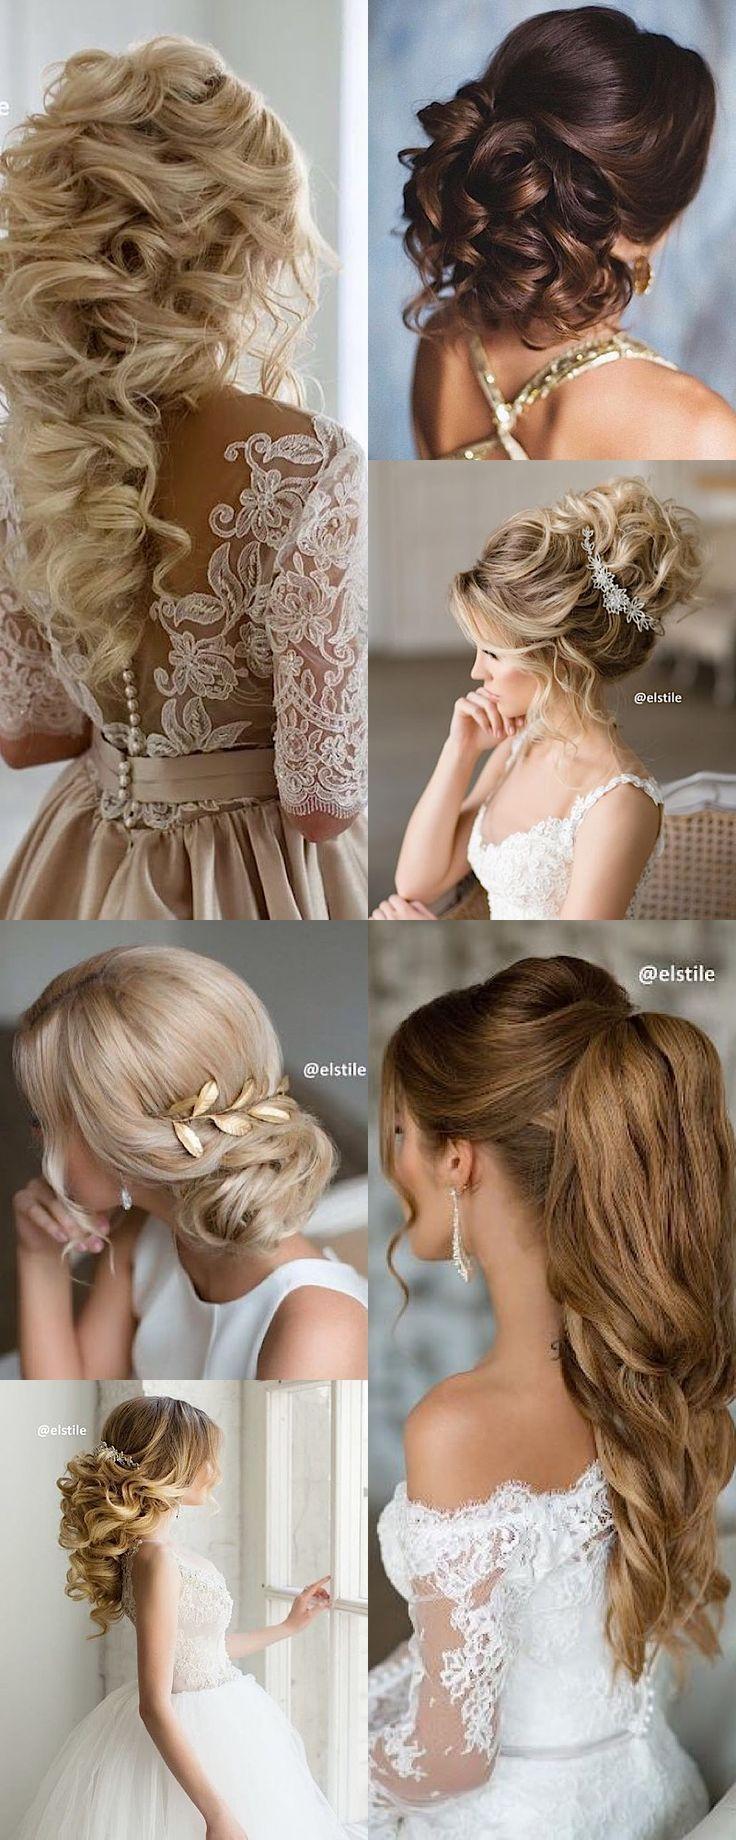 wedding hairstyles | weddings, hair style and wedding